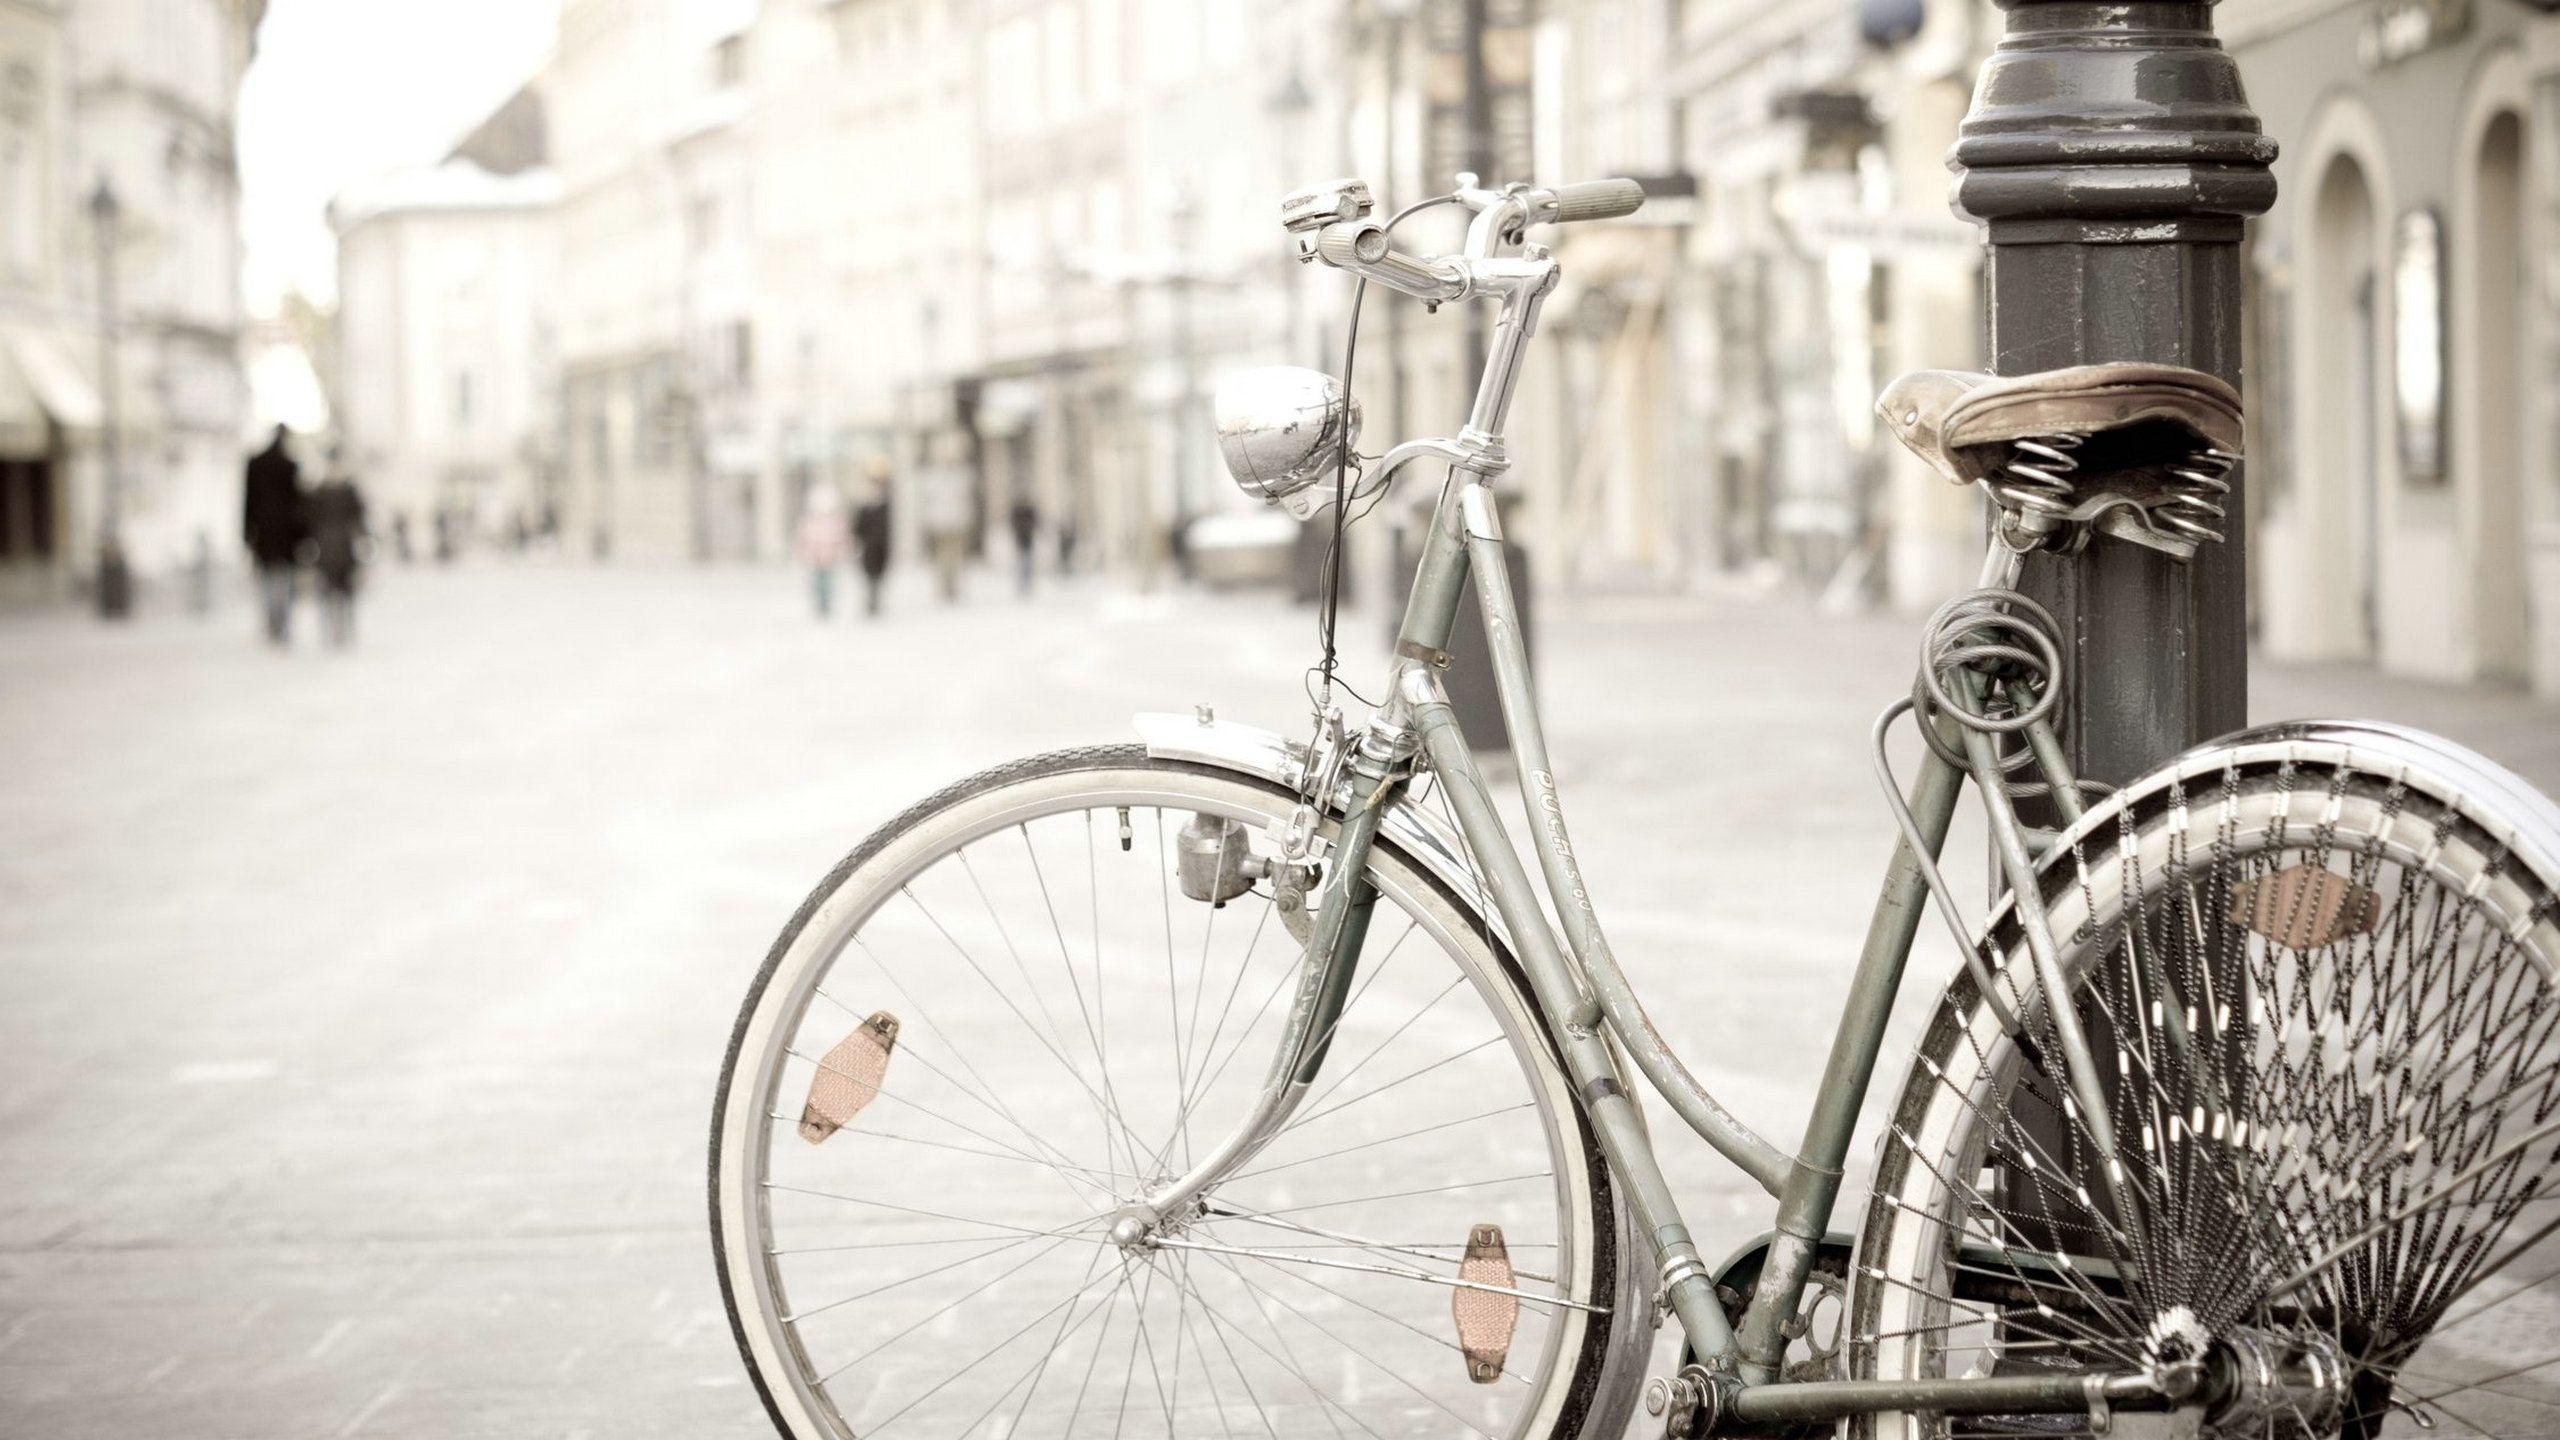 Bicycle 1910958 Velosiped Gorod Oboi